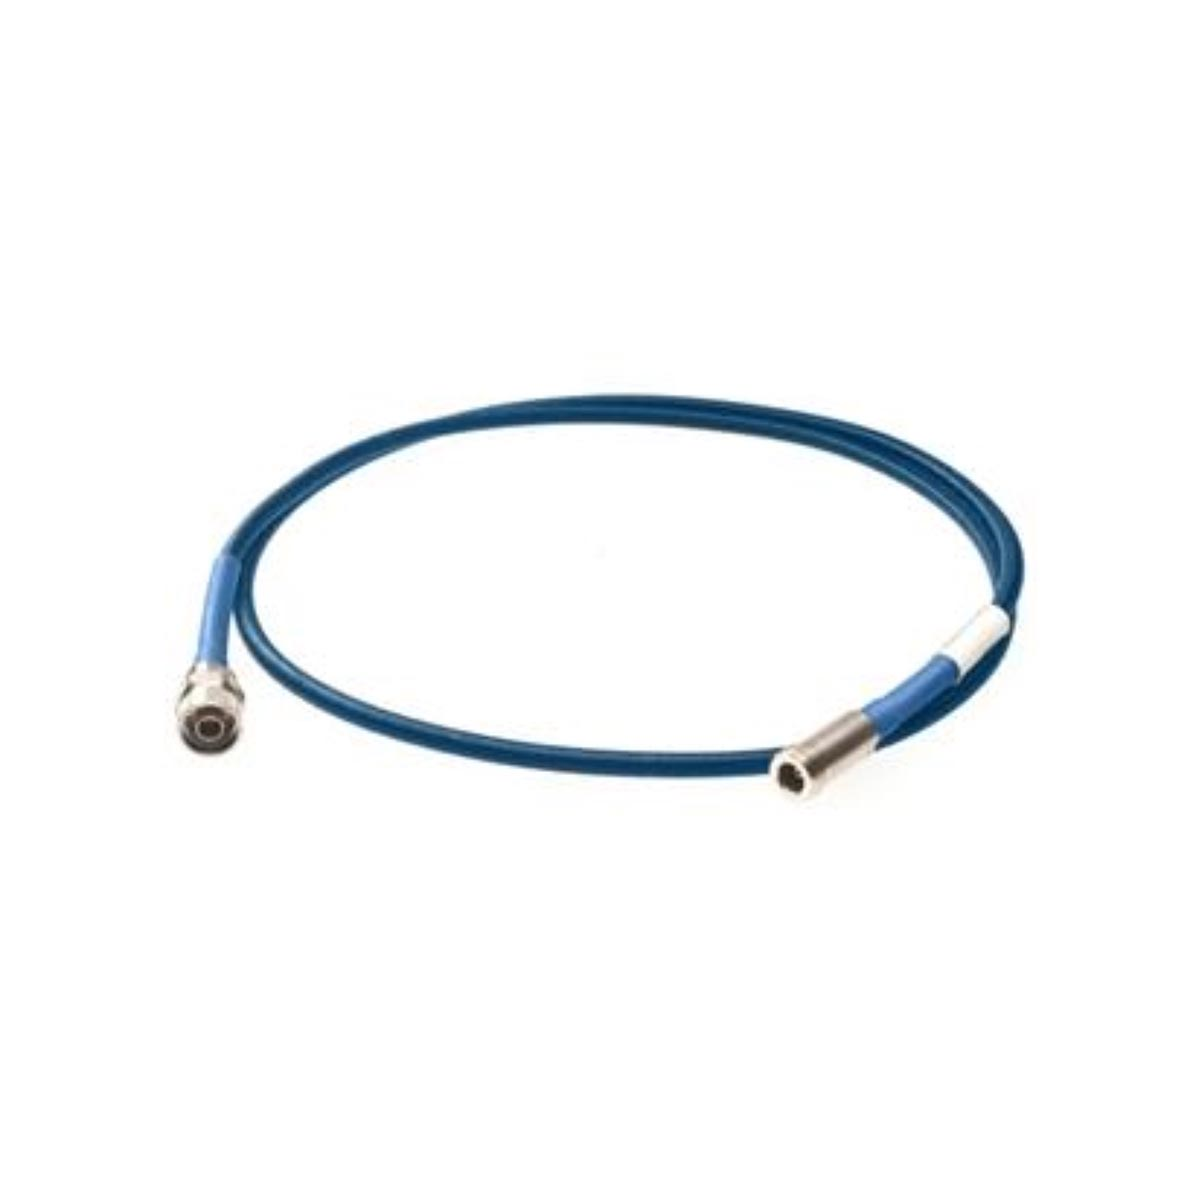 Cables de prueba RF Bird RF TC-MNFN-1-5 DC-6 GHz TC-MNFN-1-5